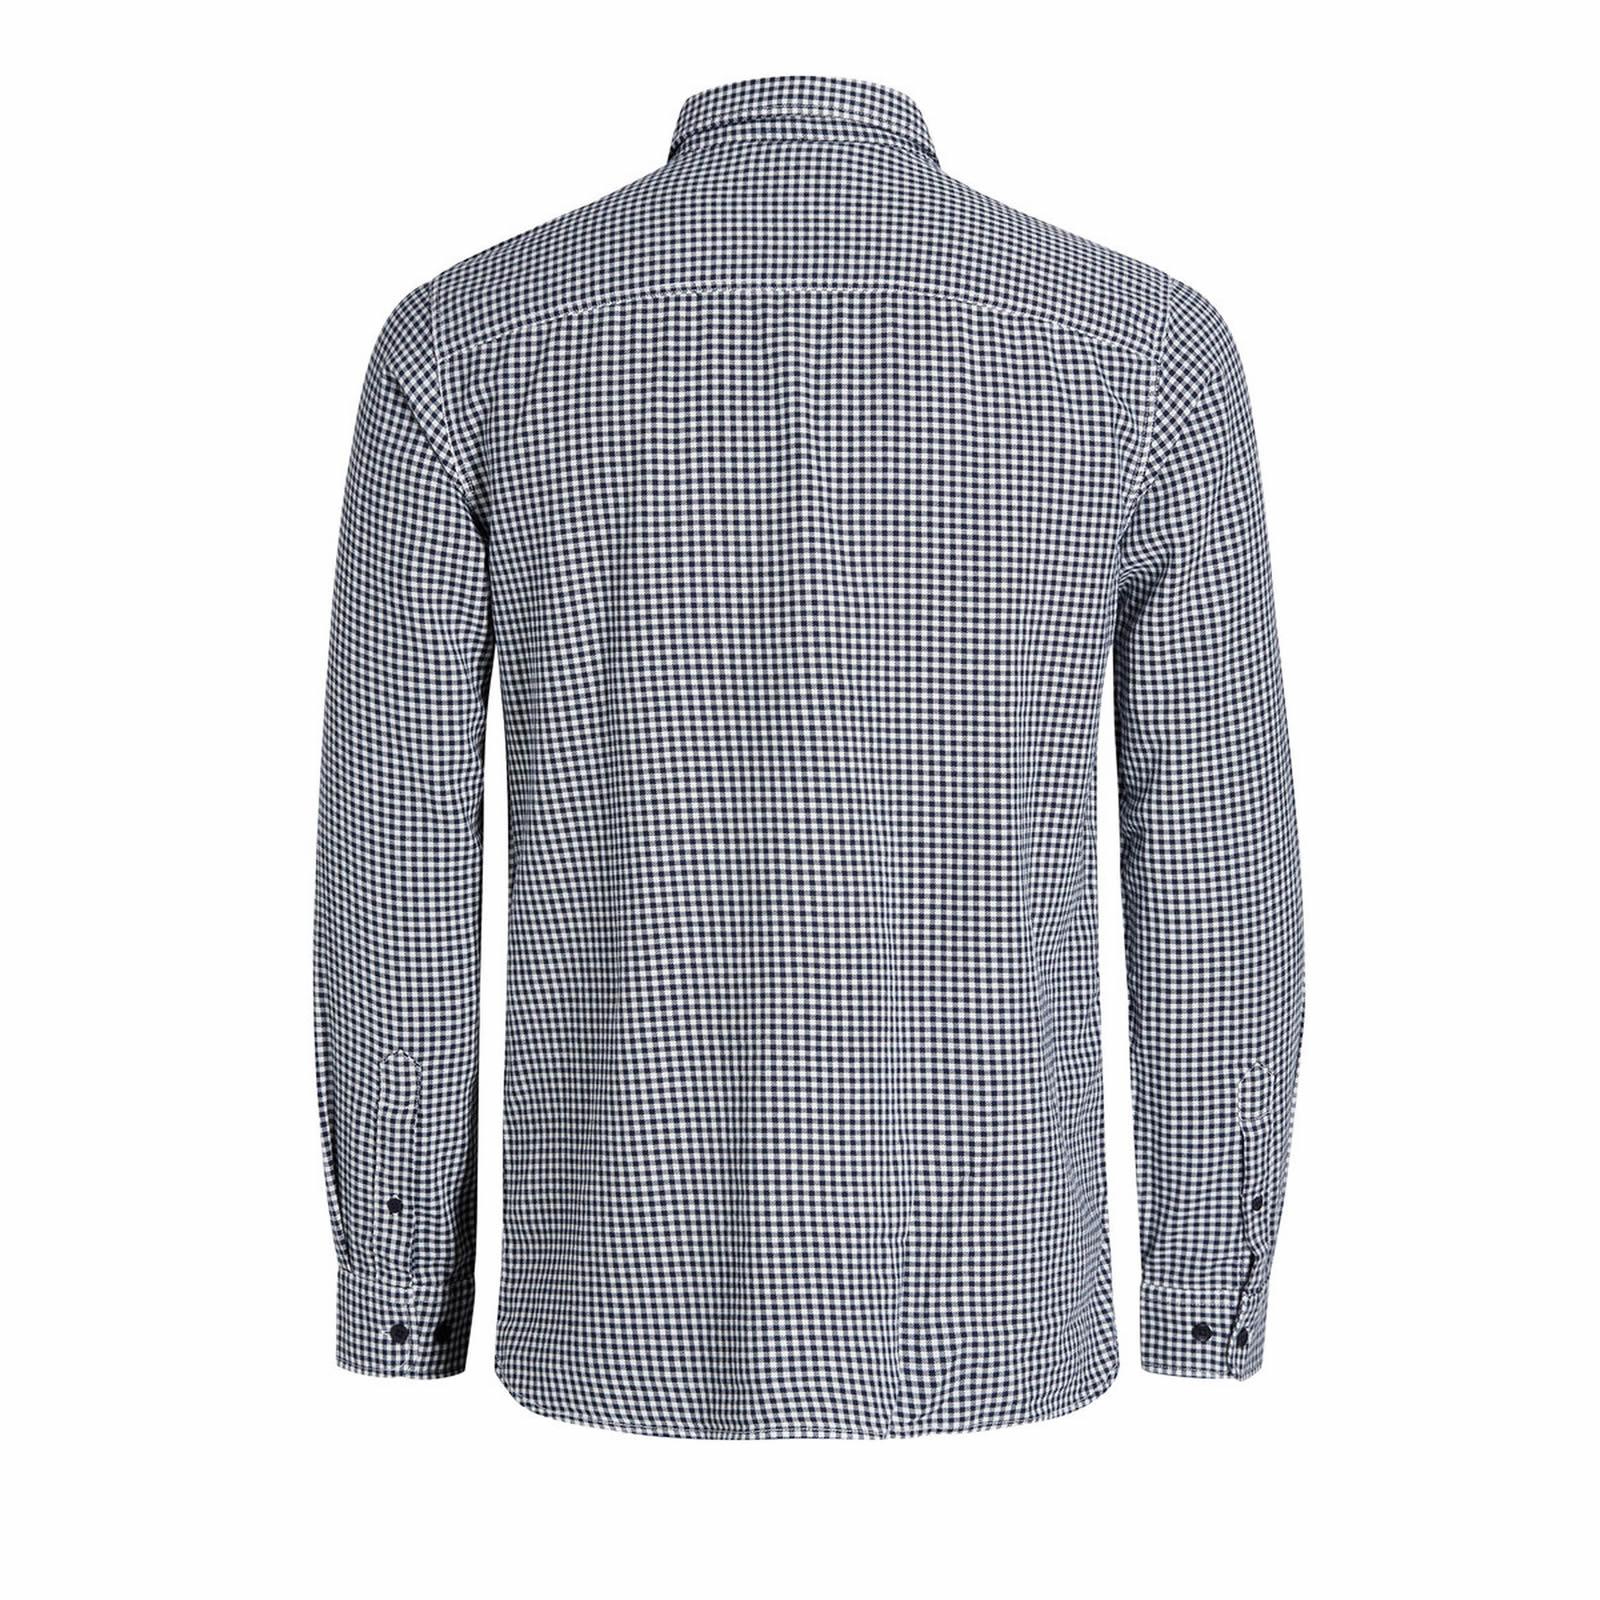 Mens-Check-Shirt-JACK-amp-JONES-Johan-Long-Sleeve-Collared-Cotton-Casual-Shirt thumbnail 6